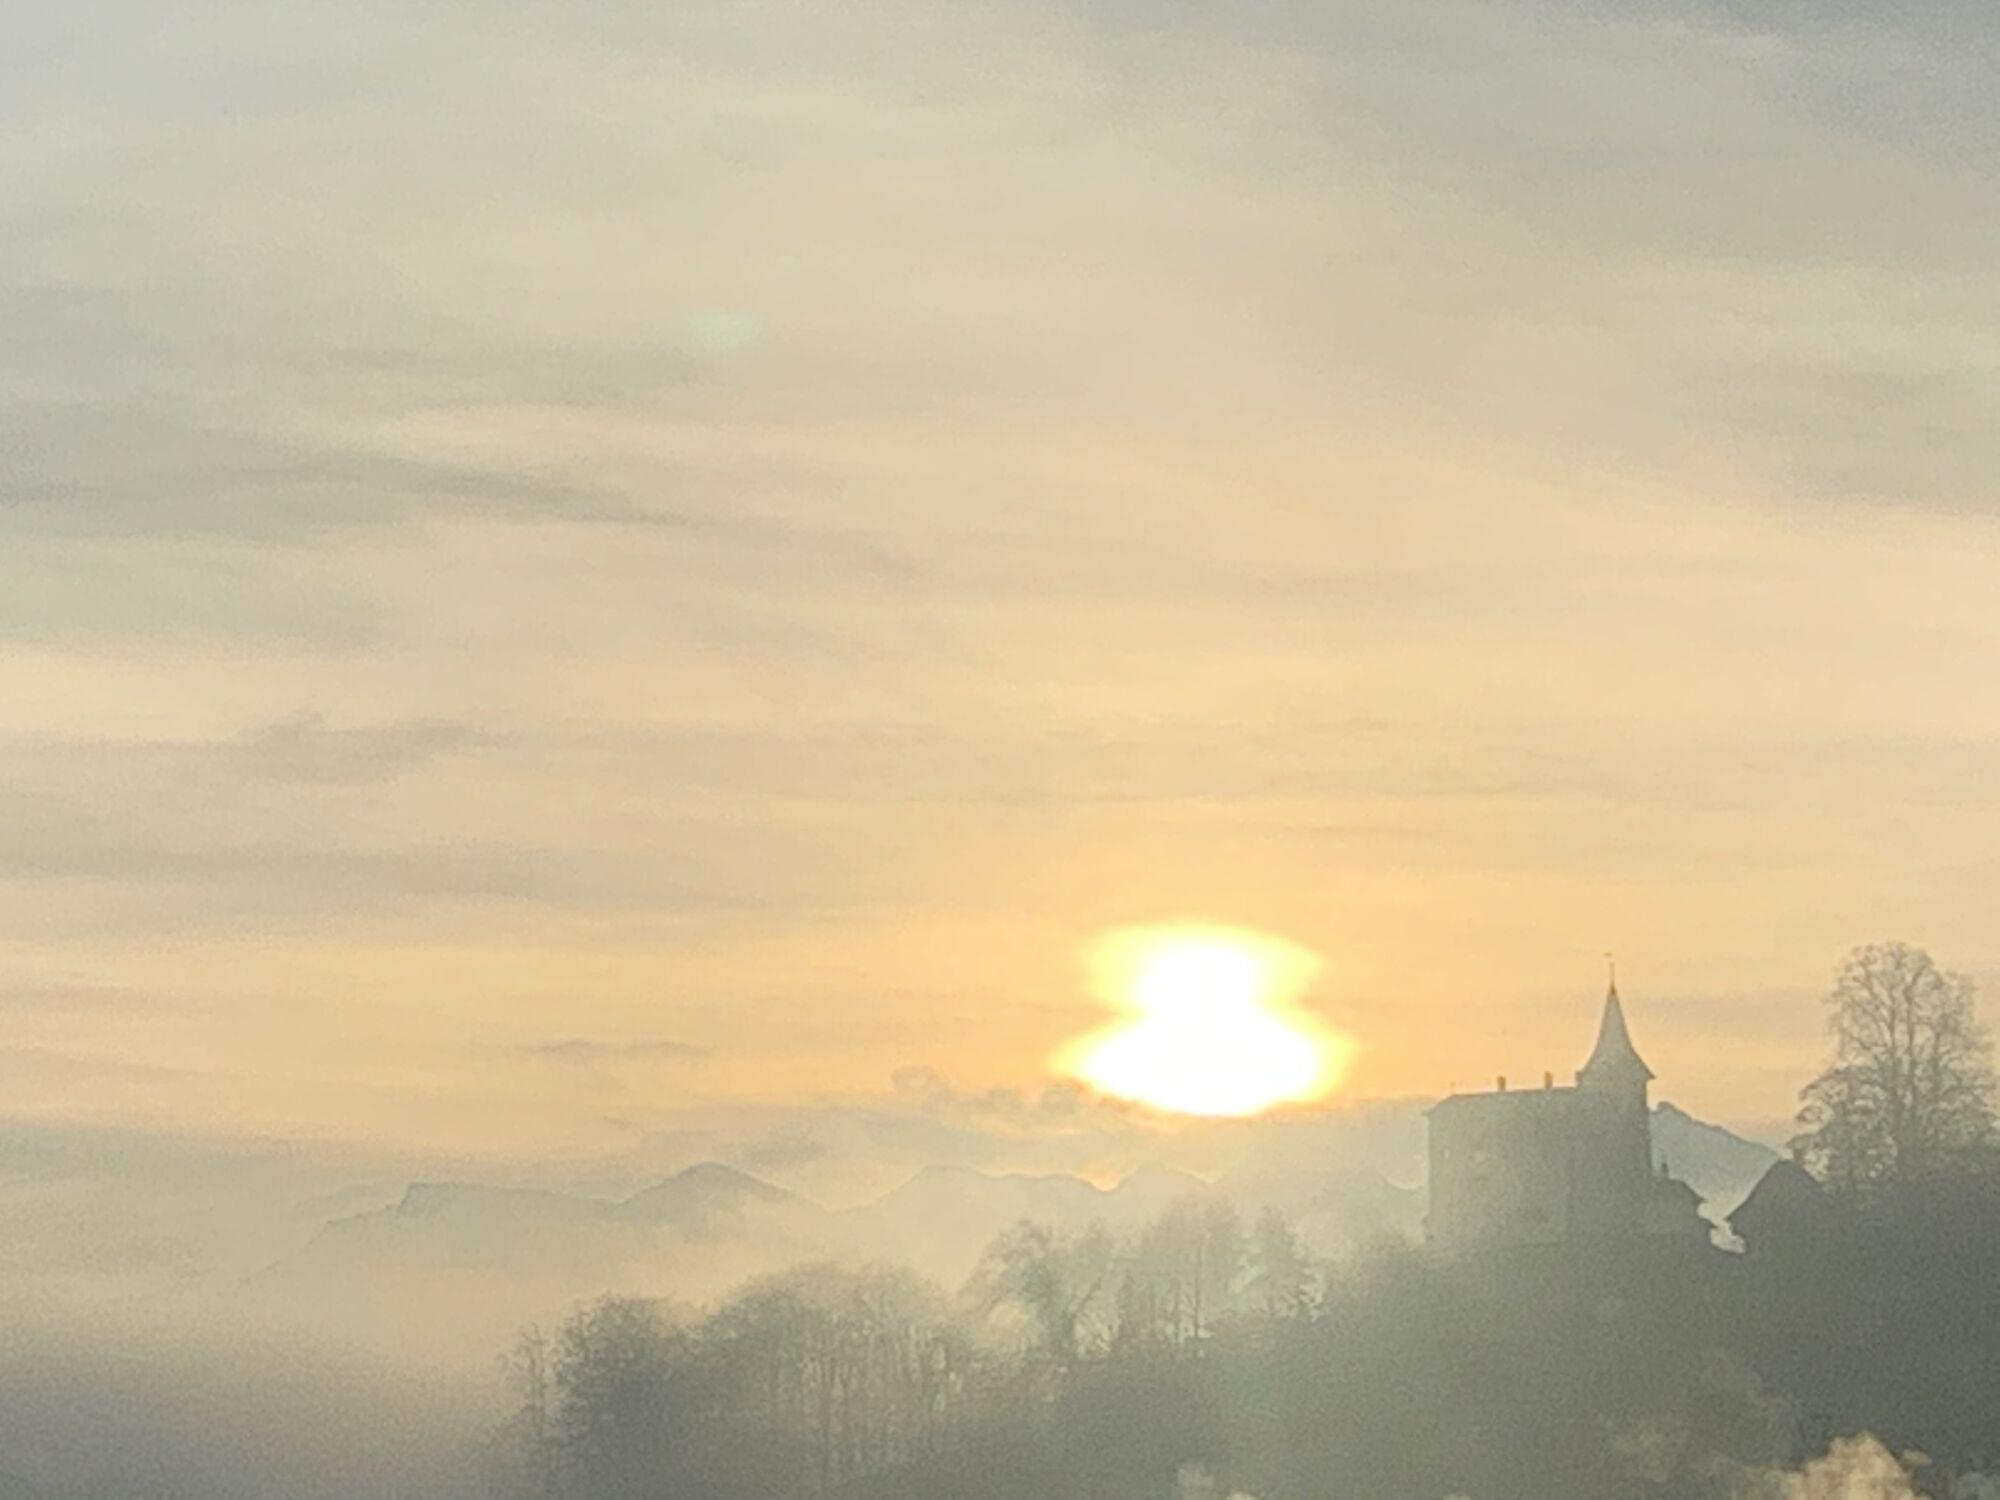 Bild mit Sonnenuntergang, Nebel, Schloss